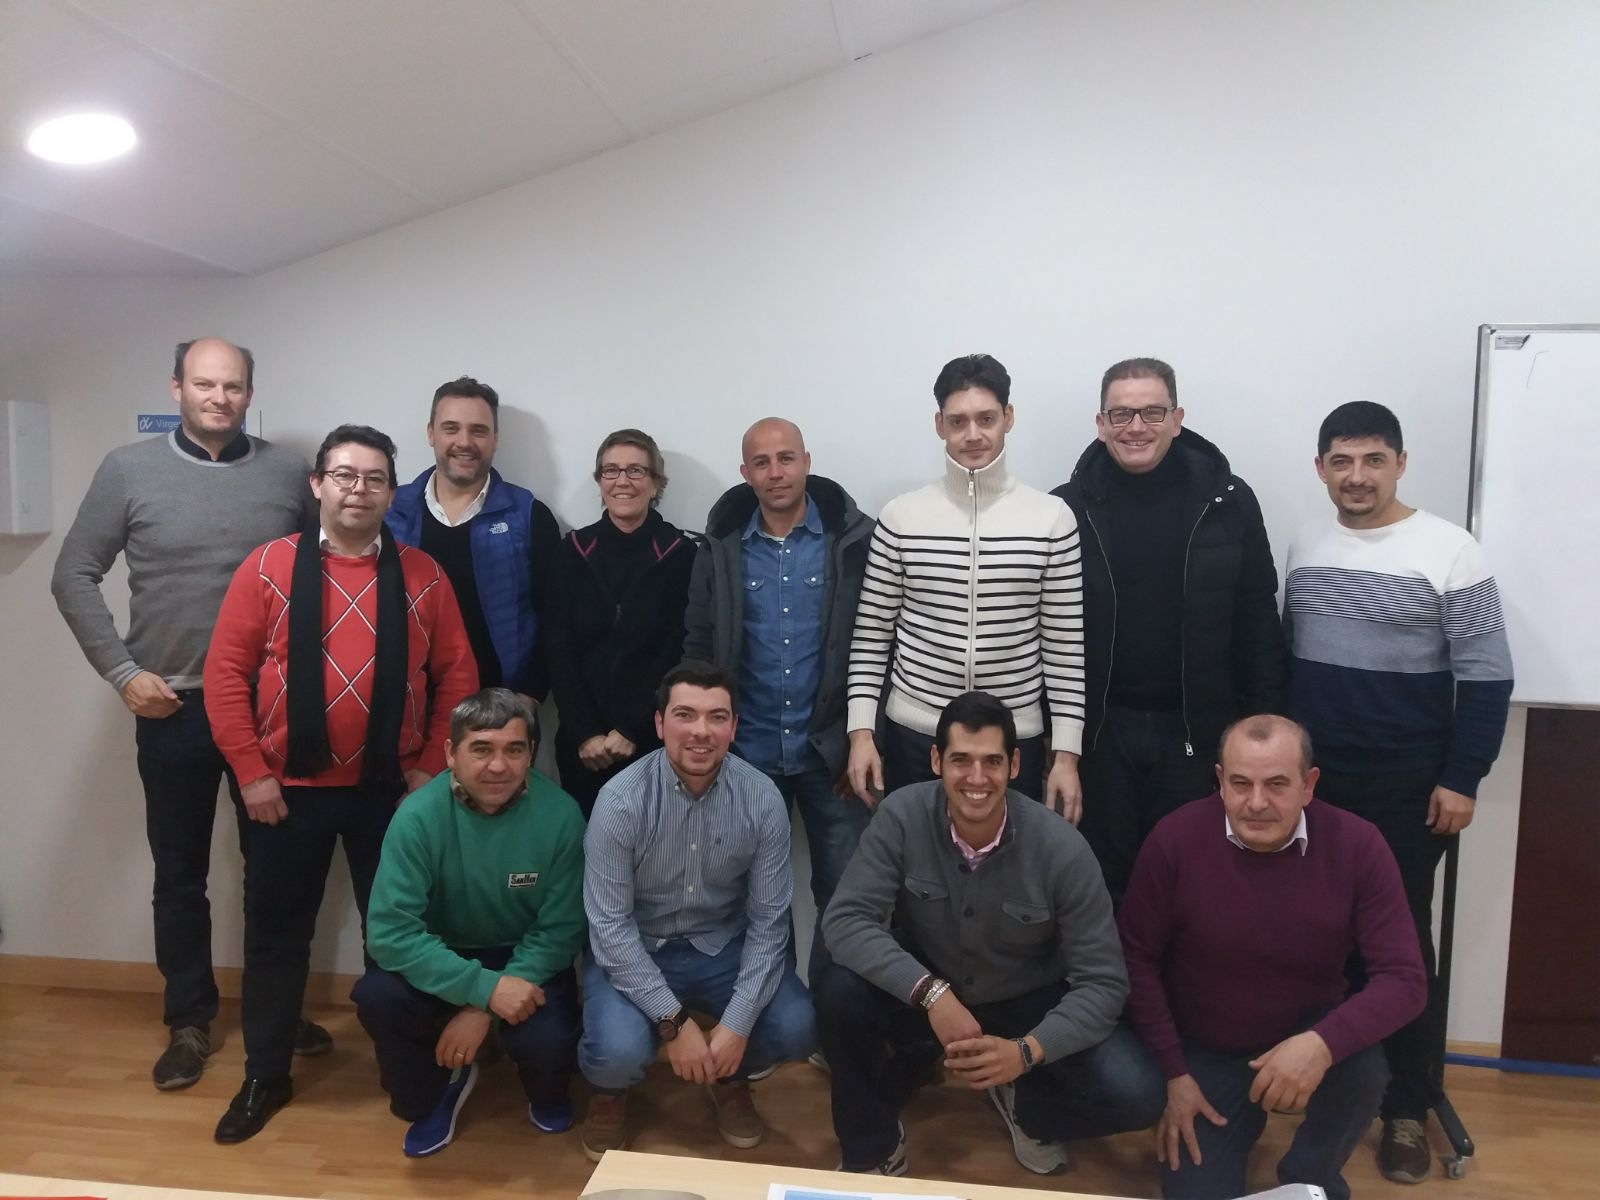 legionella-enero-2018